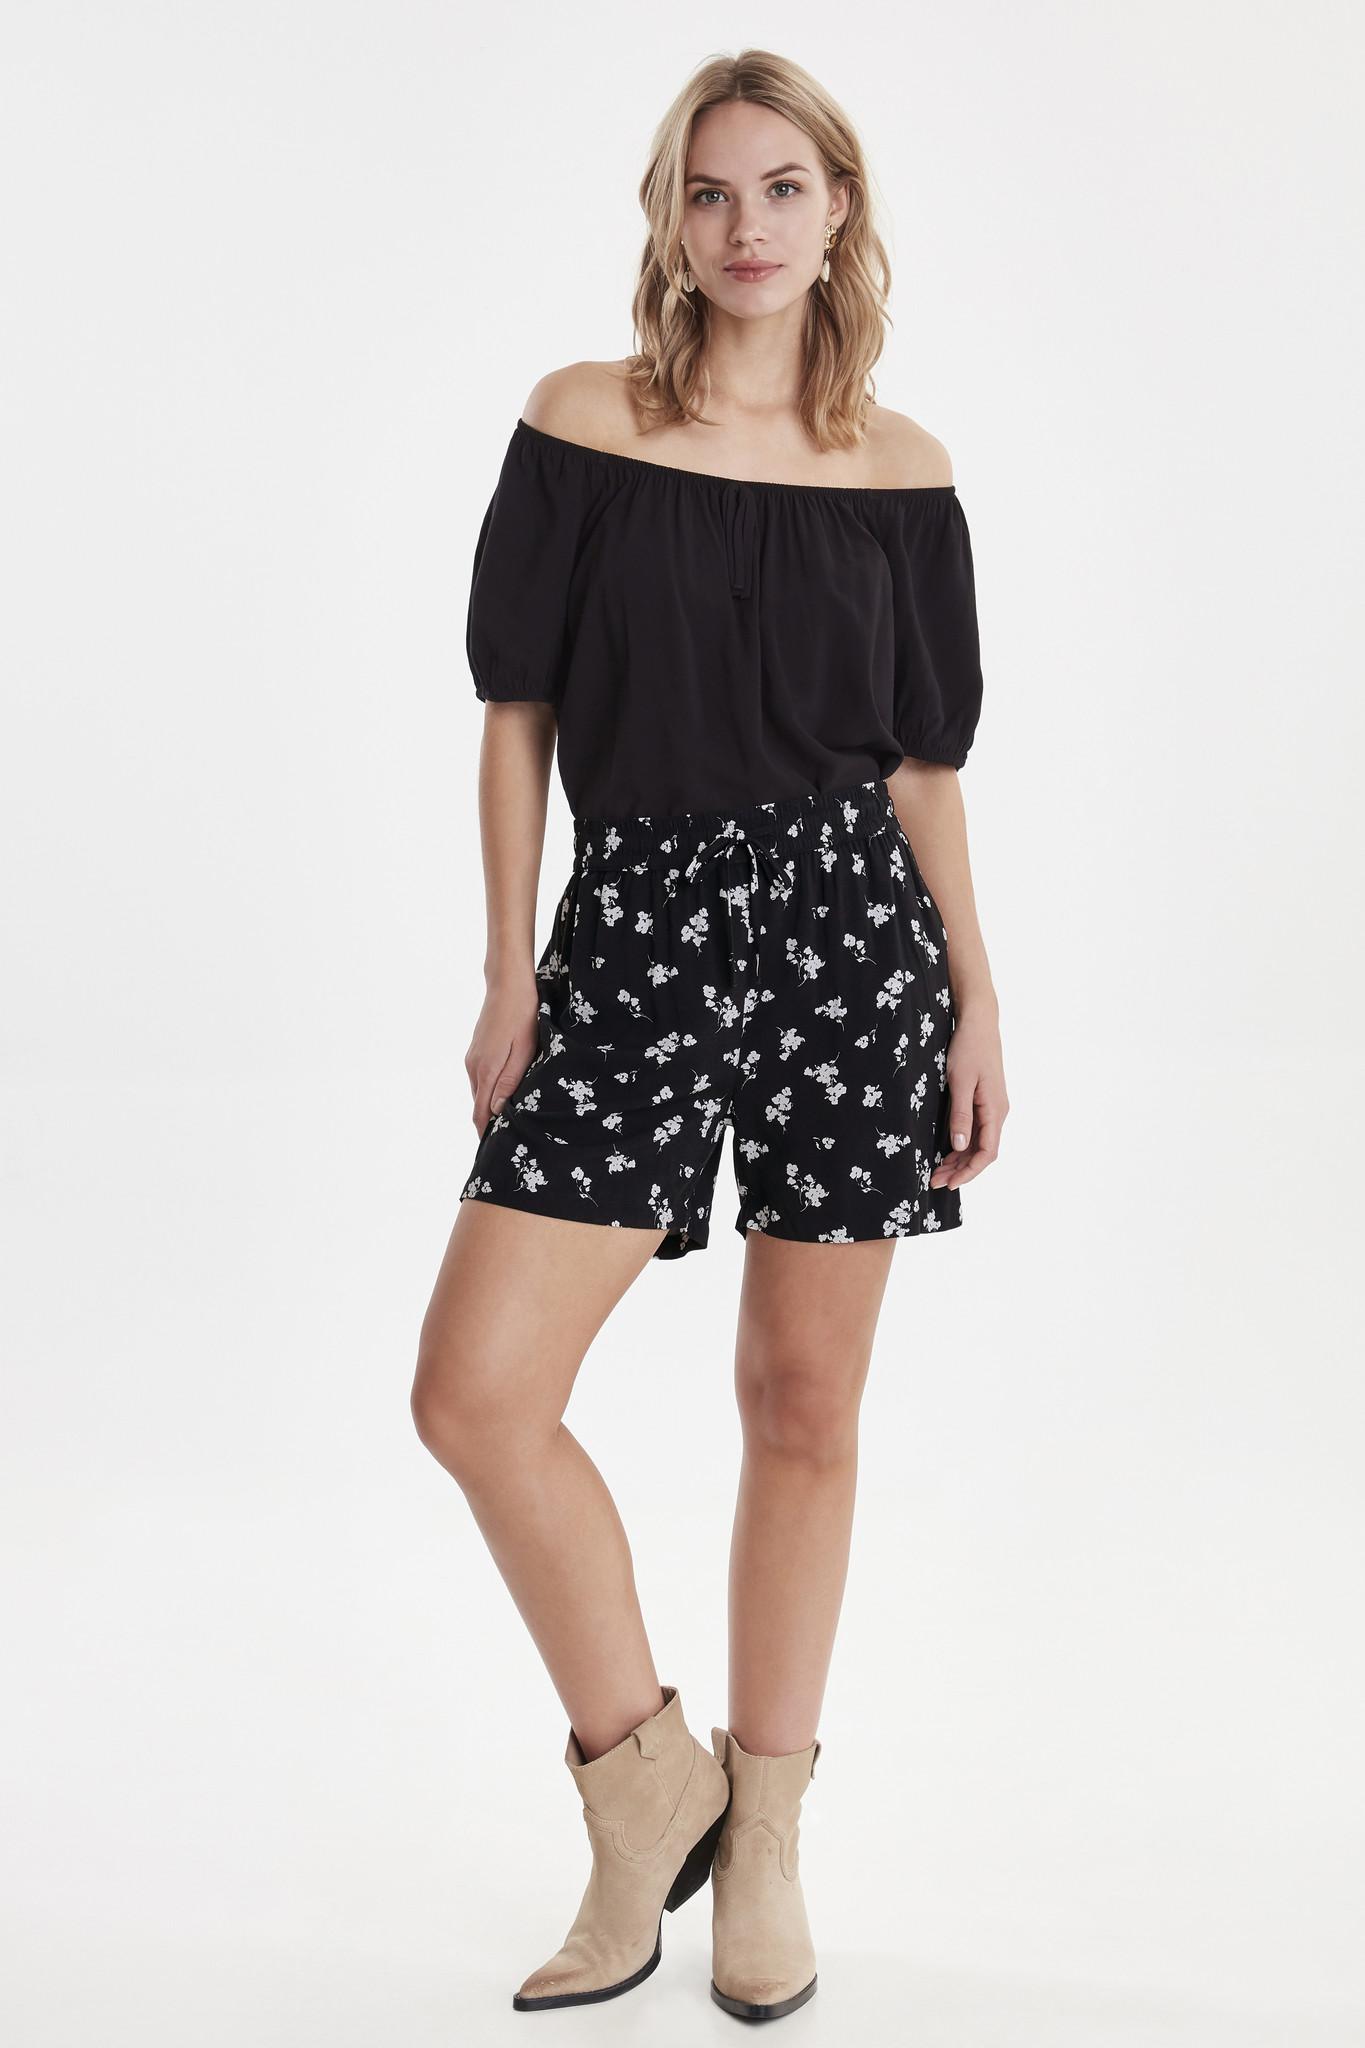 byisole shorts black combi 5-1